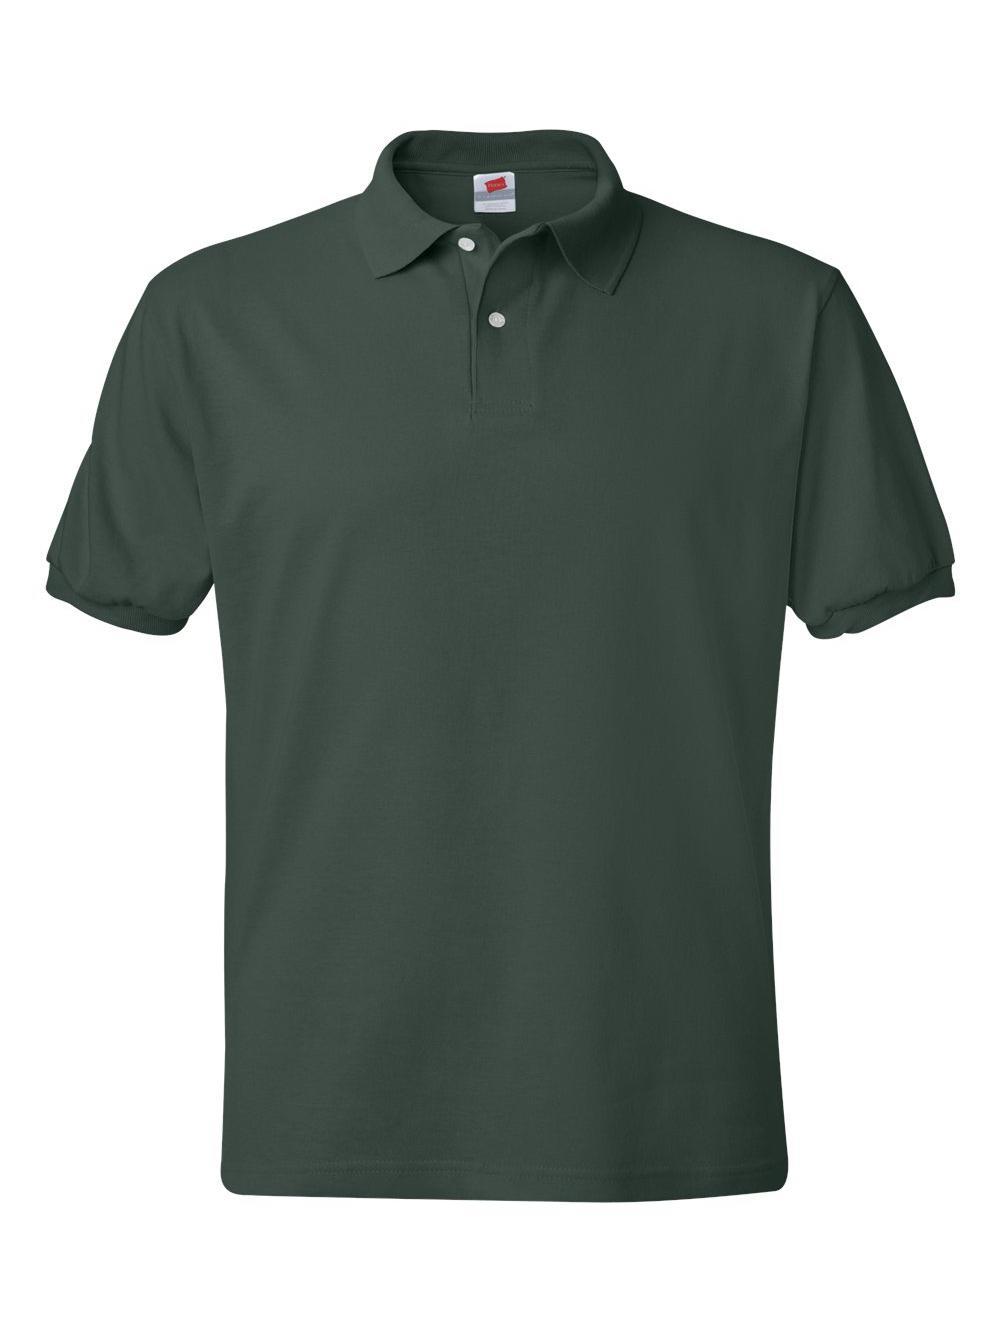 Hanes-Ecosmart-Jersey-Sport-Shirt-054X thumbnail 12